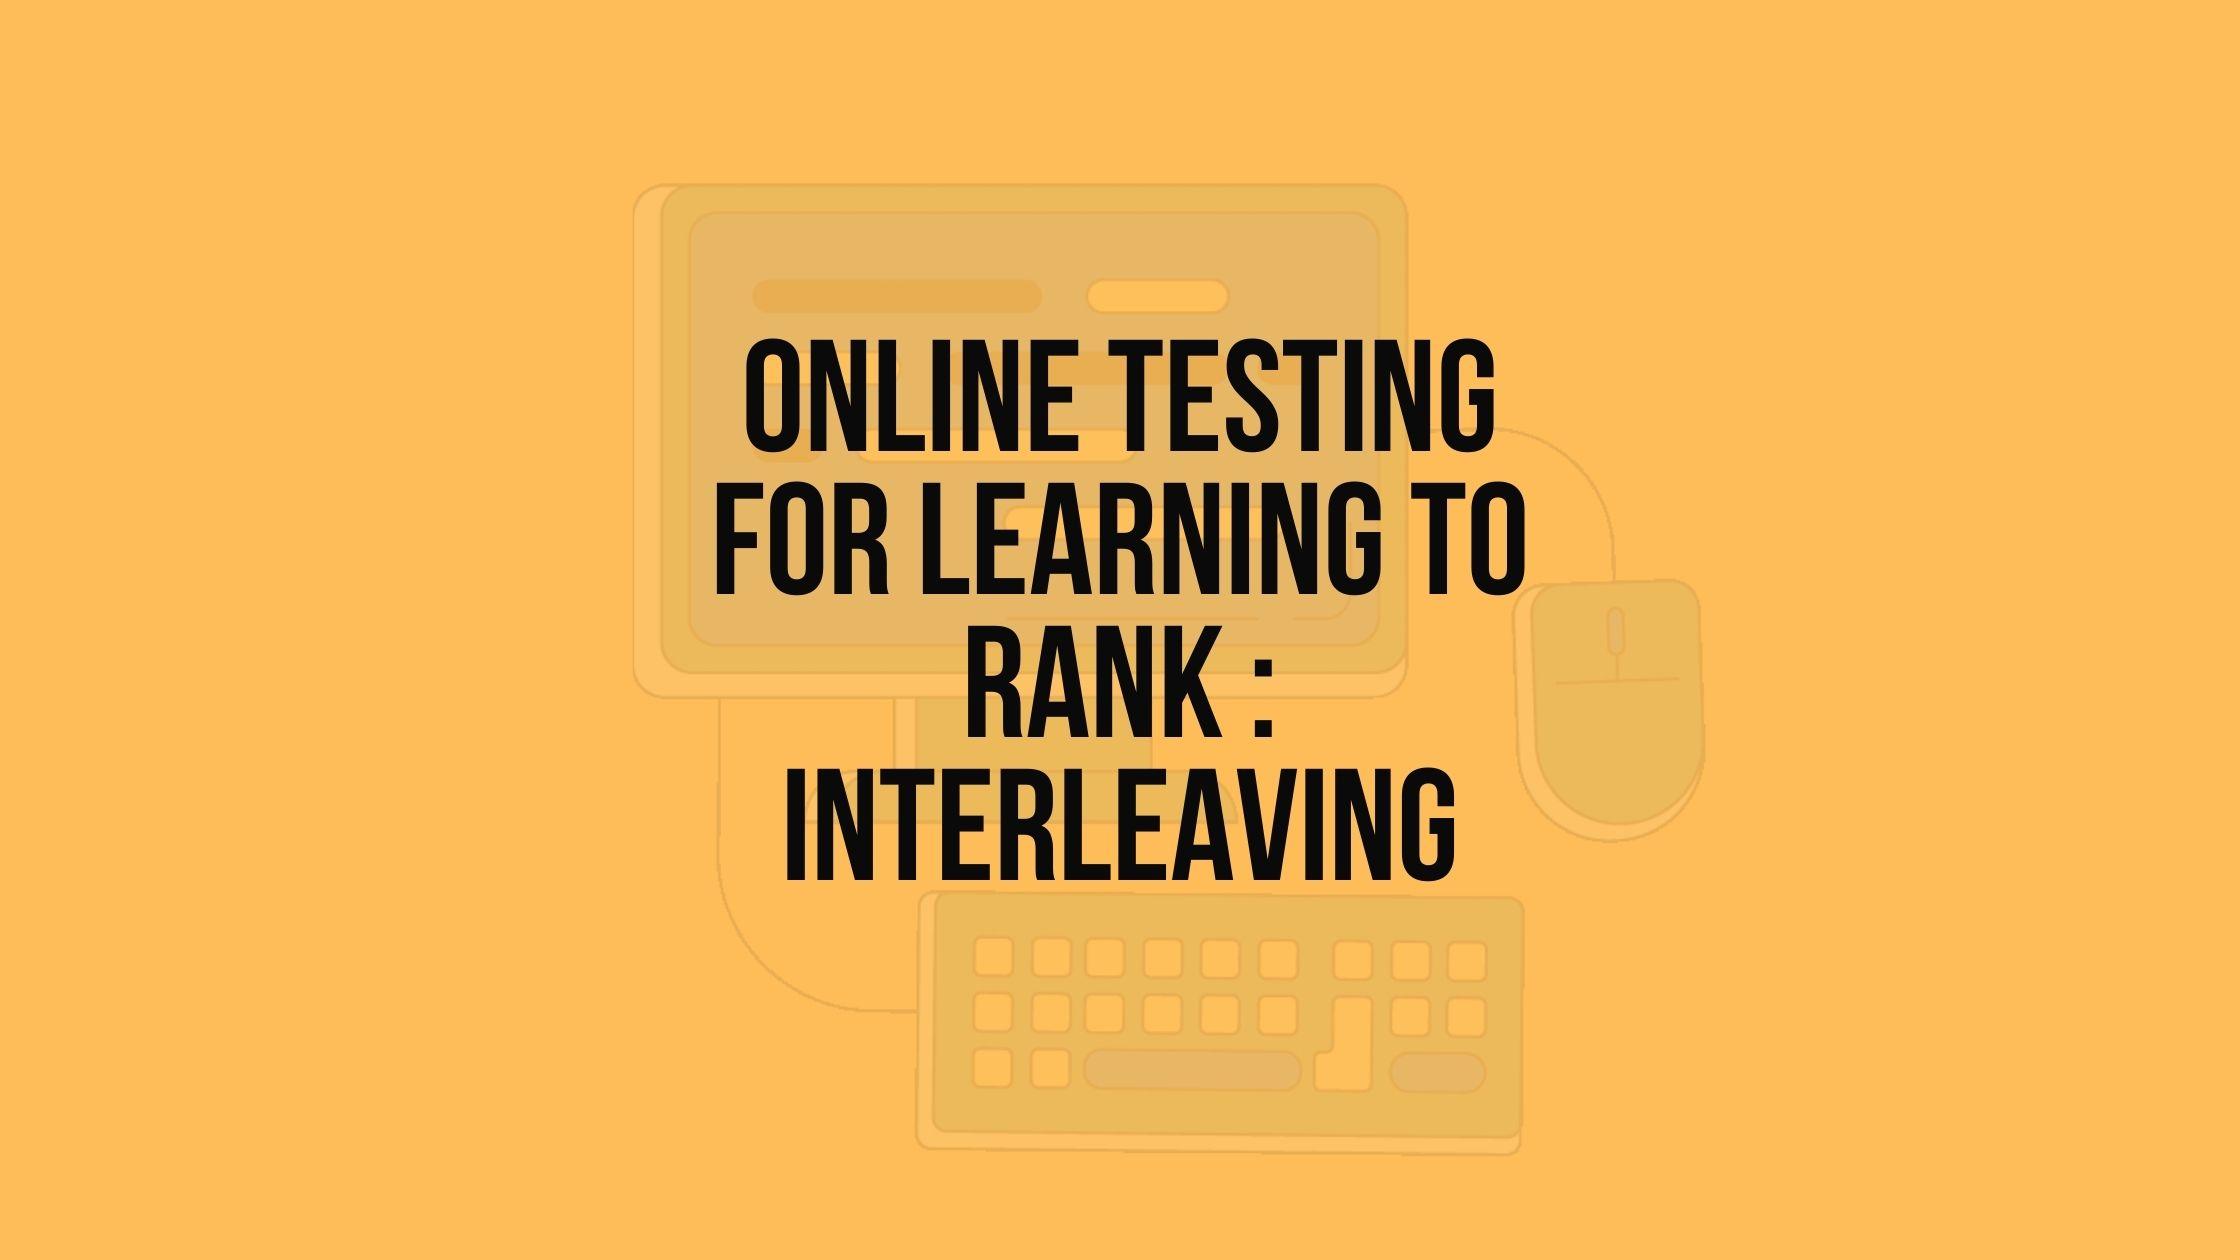 interleaving learning to rank